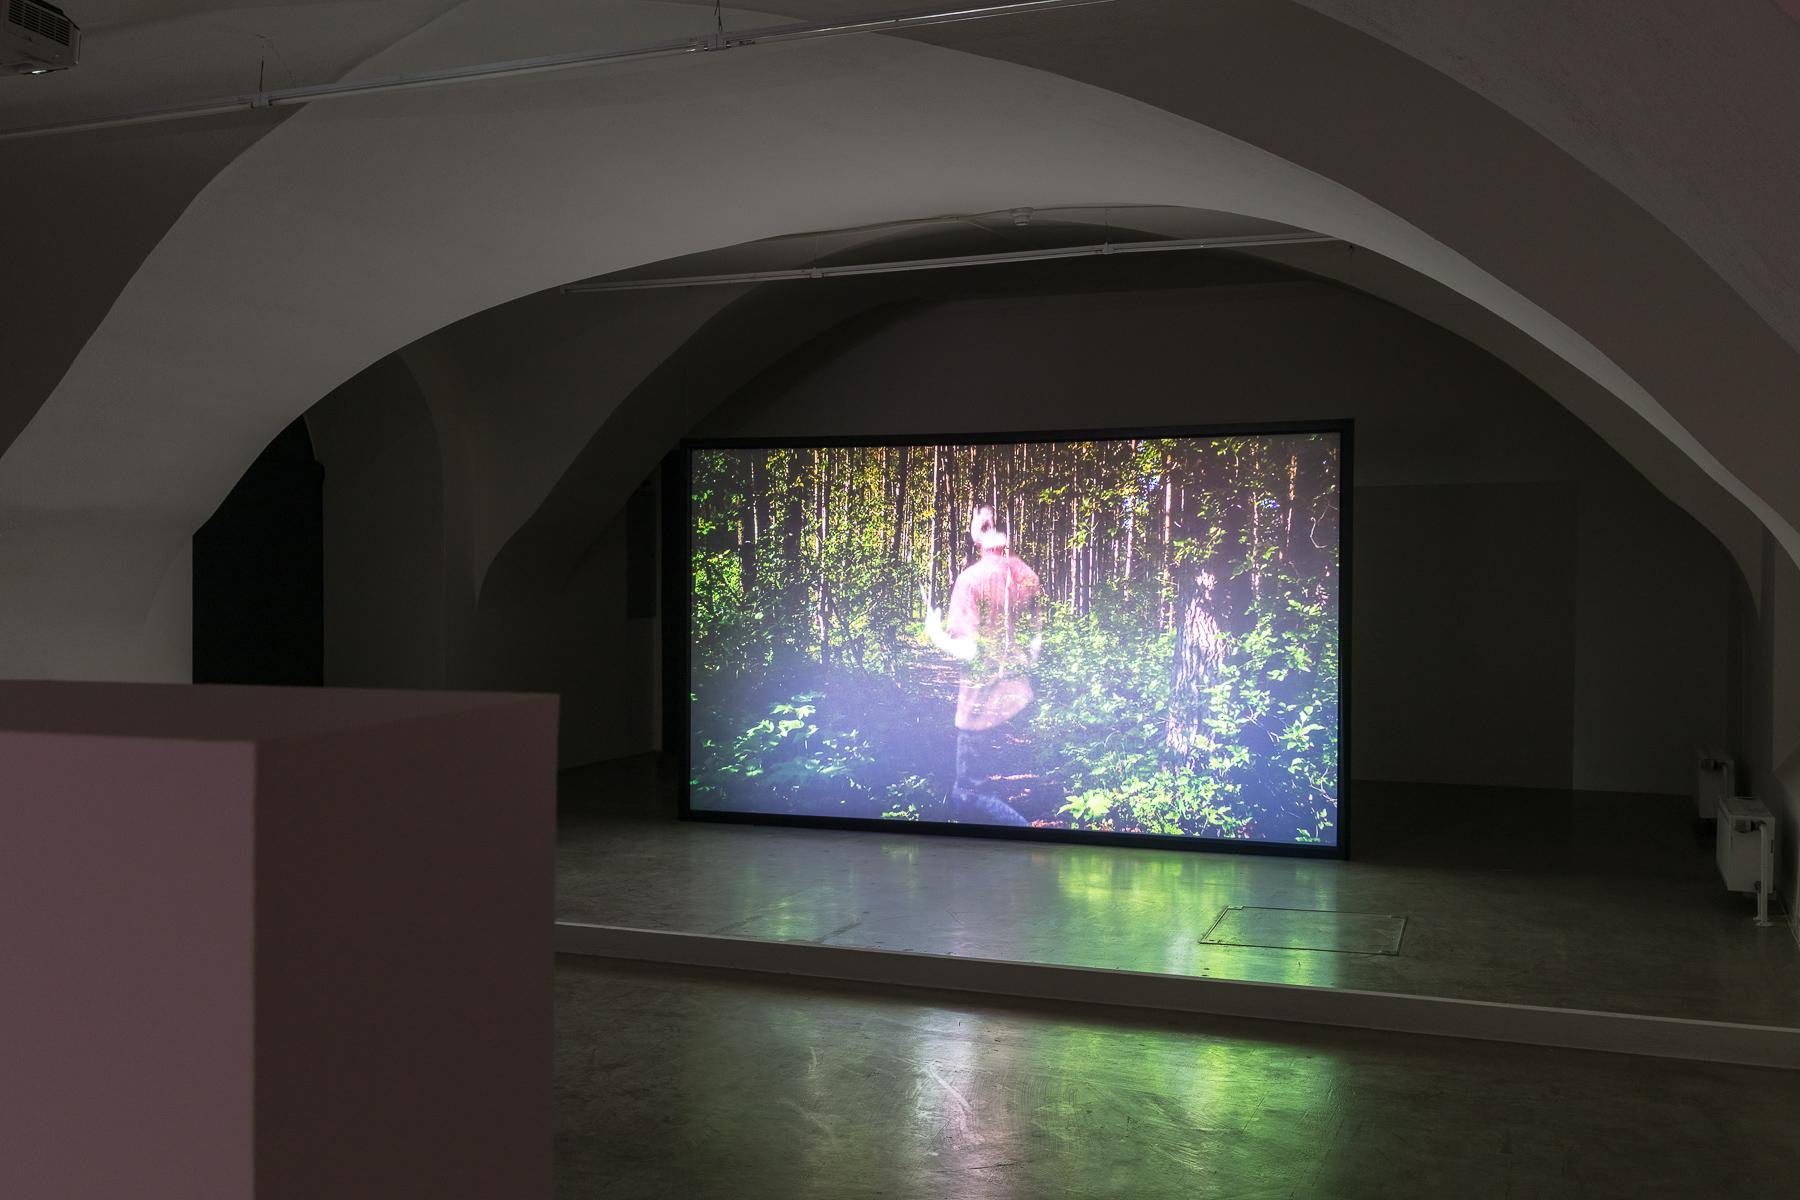 2019_03_11_Grazer Kunstverein_052_web.jpg